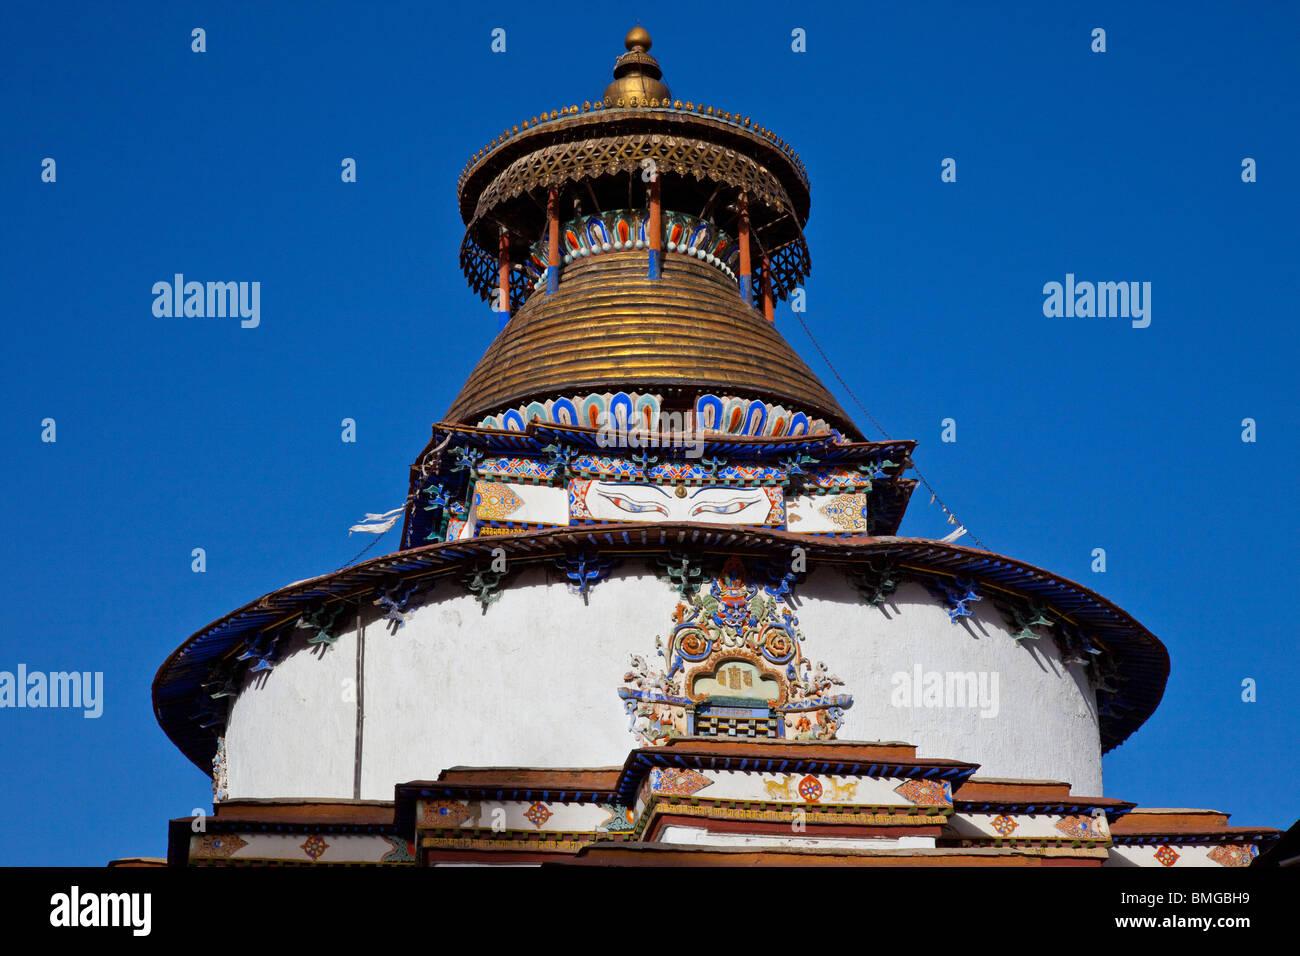 Gyantse Kumbum at Pelkor Chode Monastery in Gyantse, Tibet - Stock Image